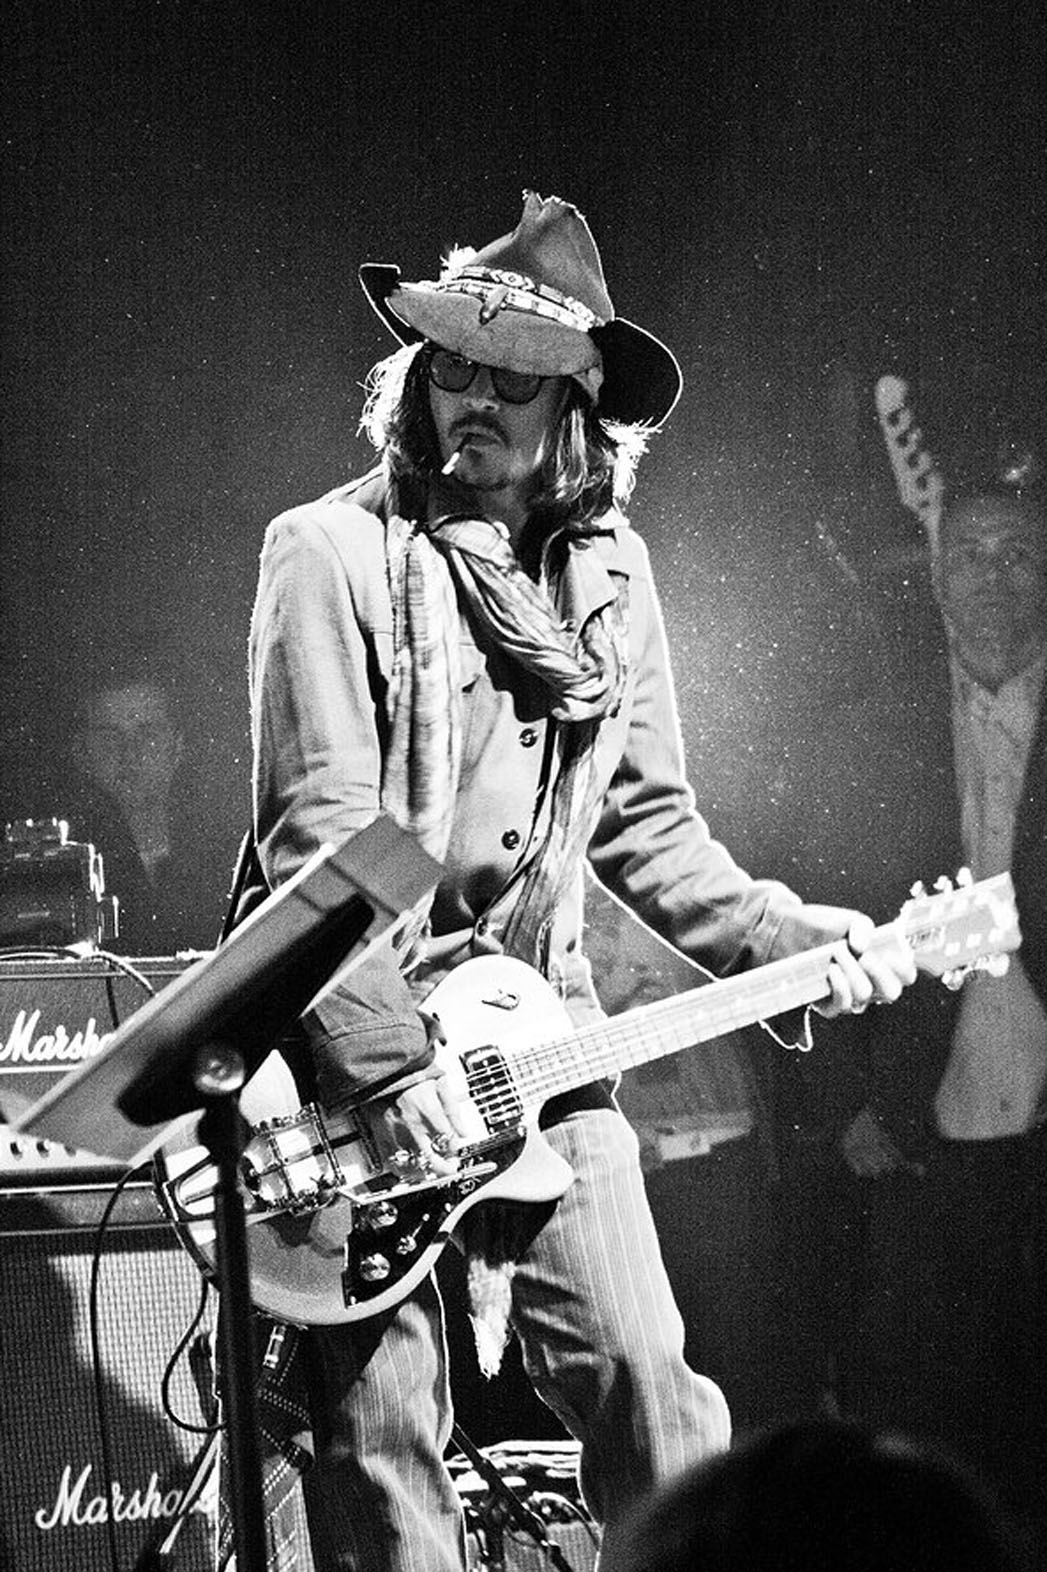 Johnny Depp Petty Fest - P 2014